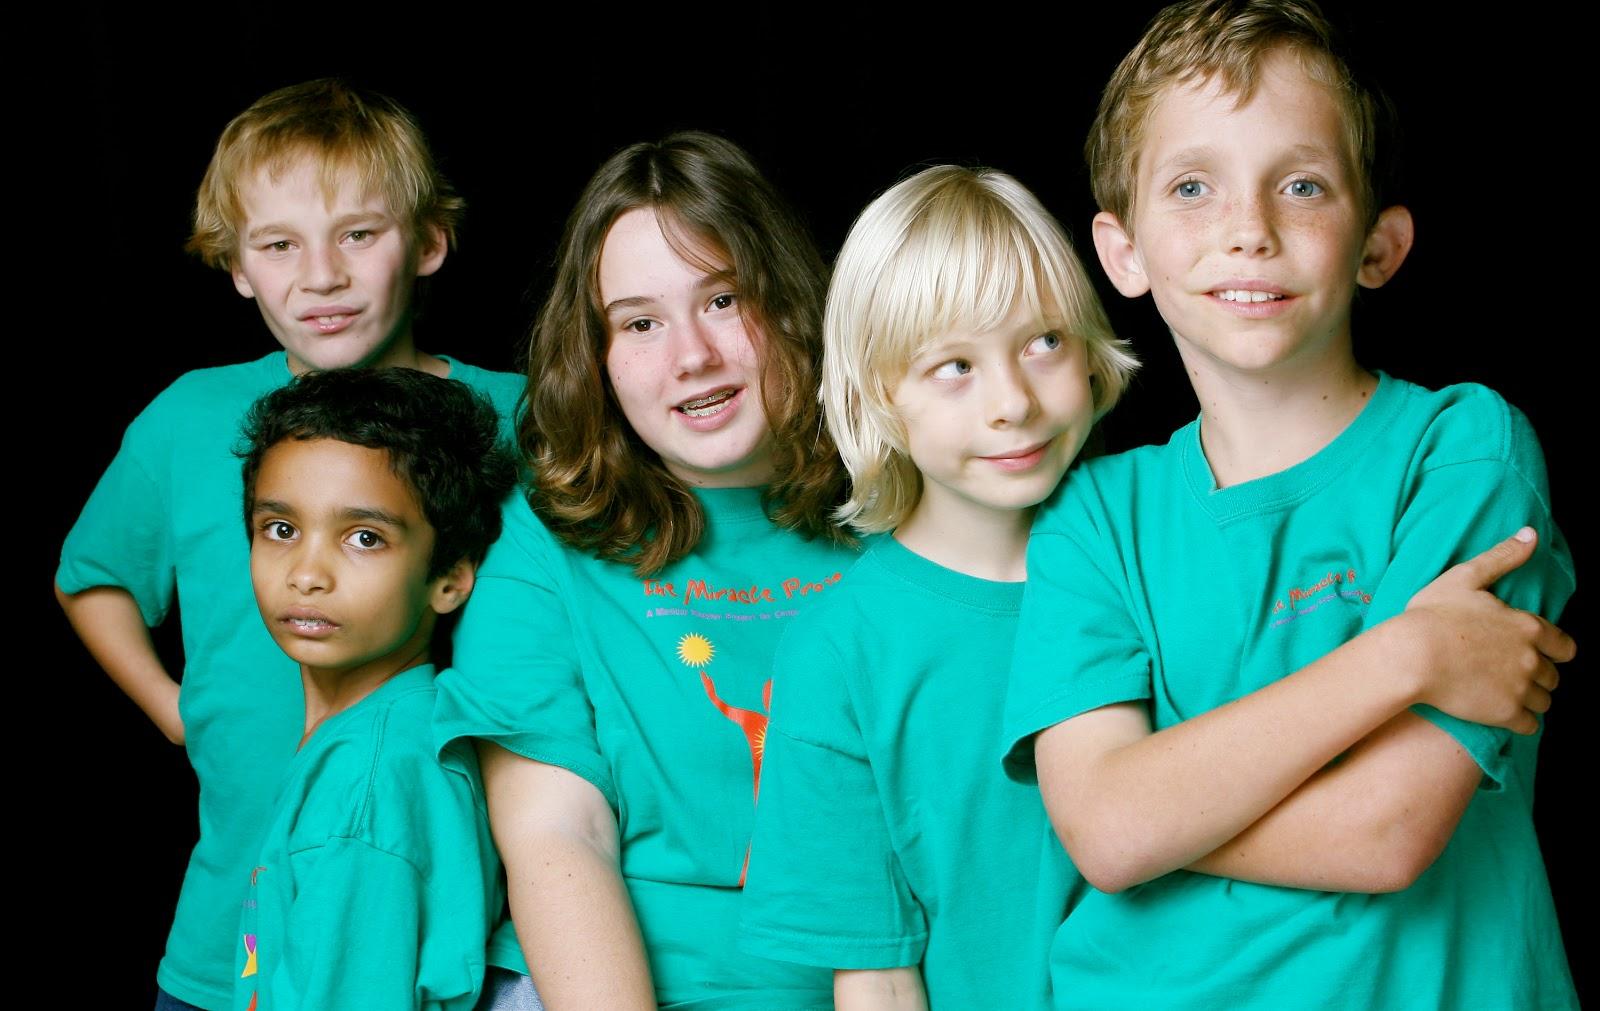 Мартин белла синдром фото детей